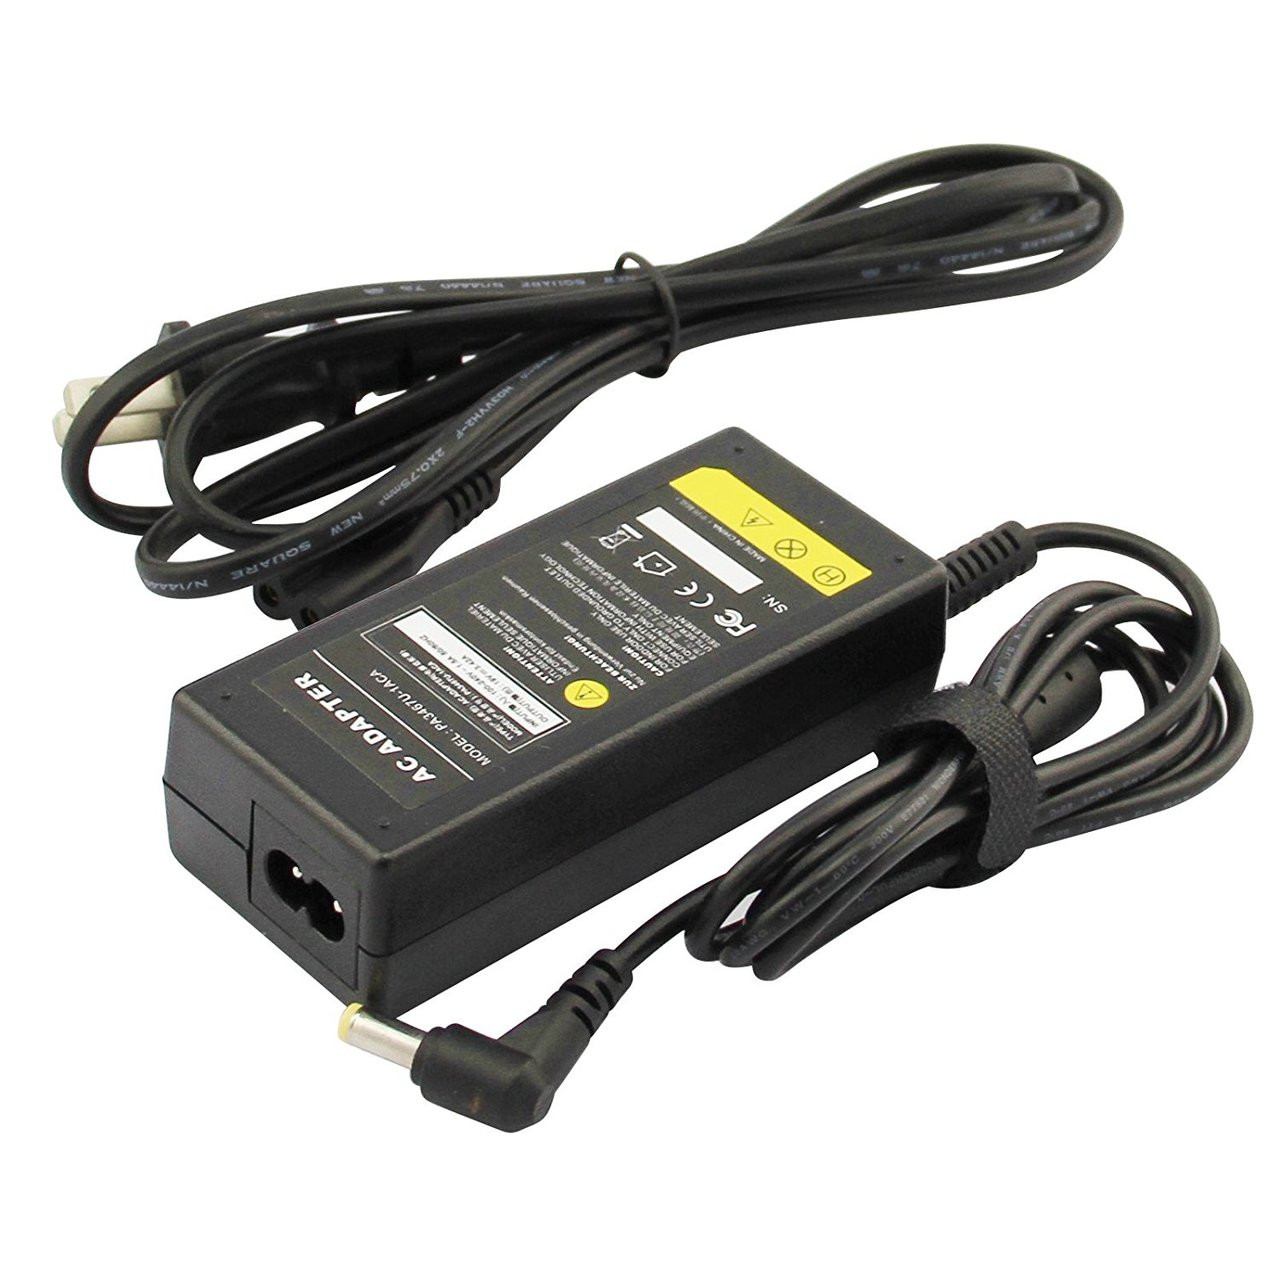 Lenovo Thinkpad AC Adapter PA-1650 65W PA-1